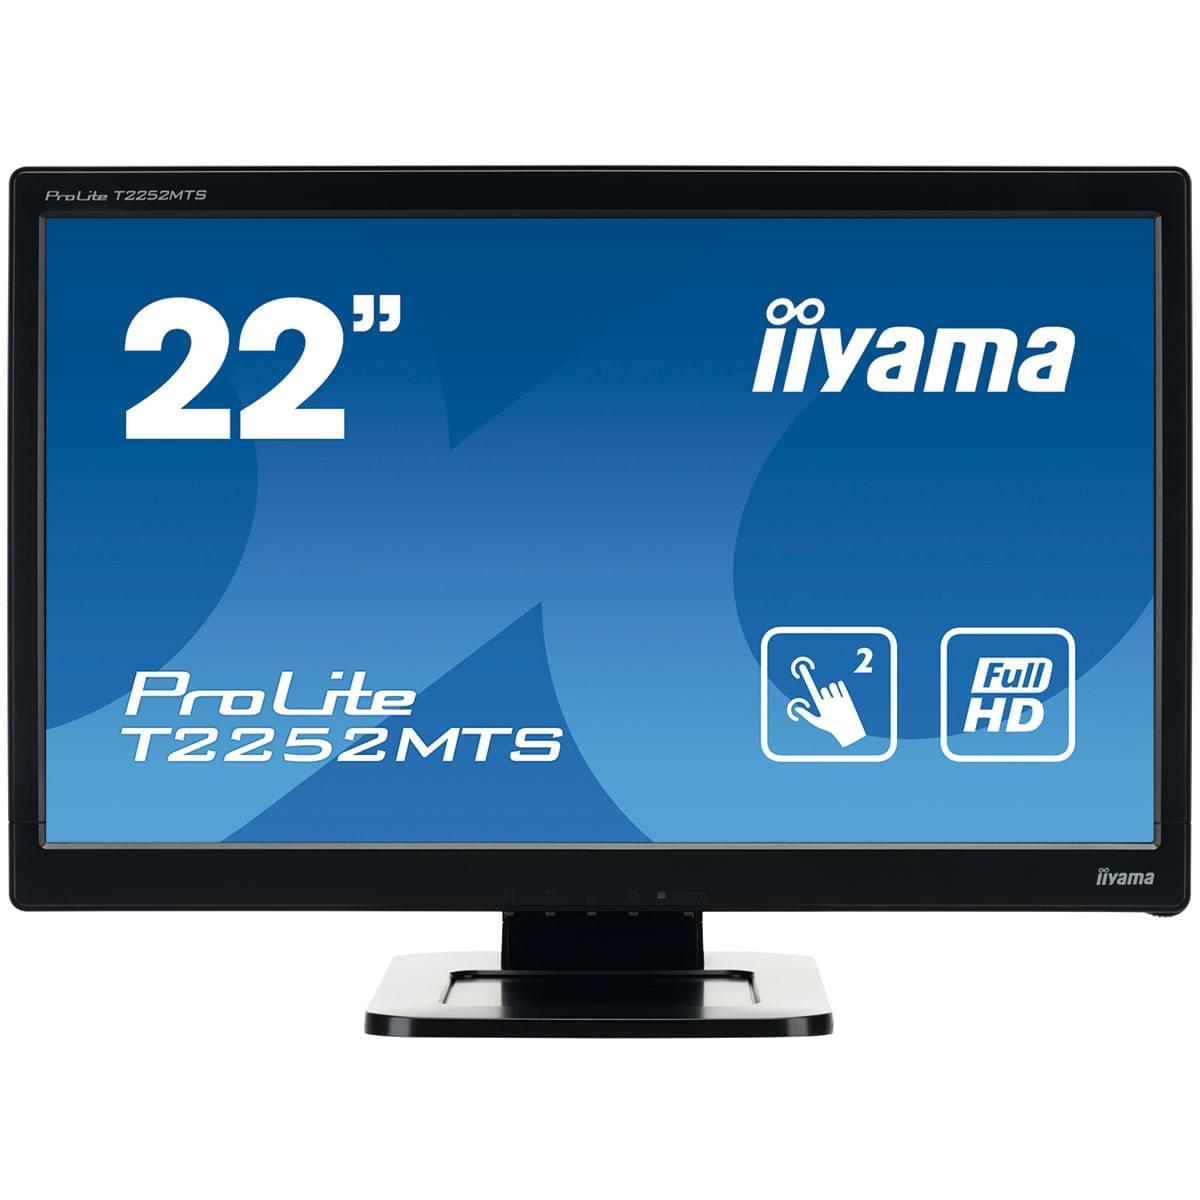 Iiyama T2252MTS-B3 (T2252MTS-B3) - Achat / Vente Ecran PC sur Cybertek.fr - 0